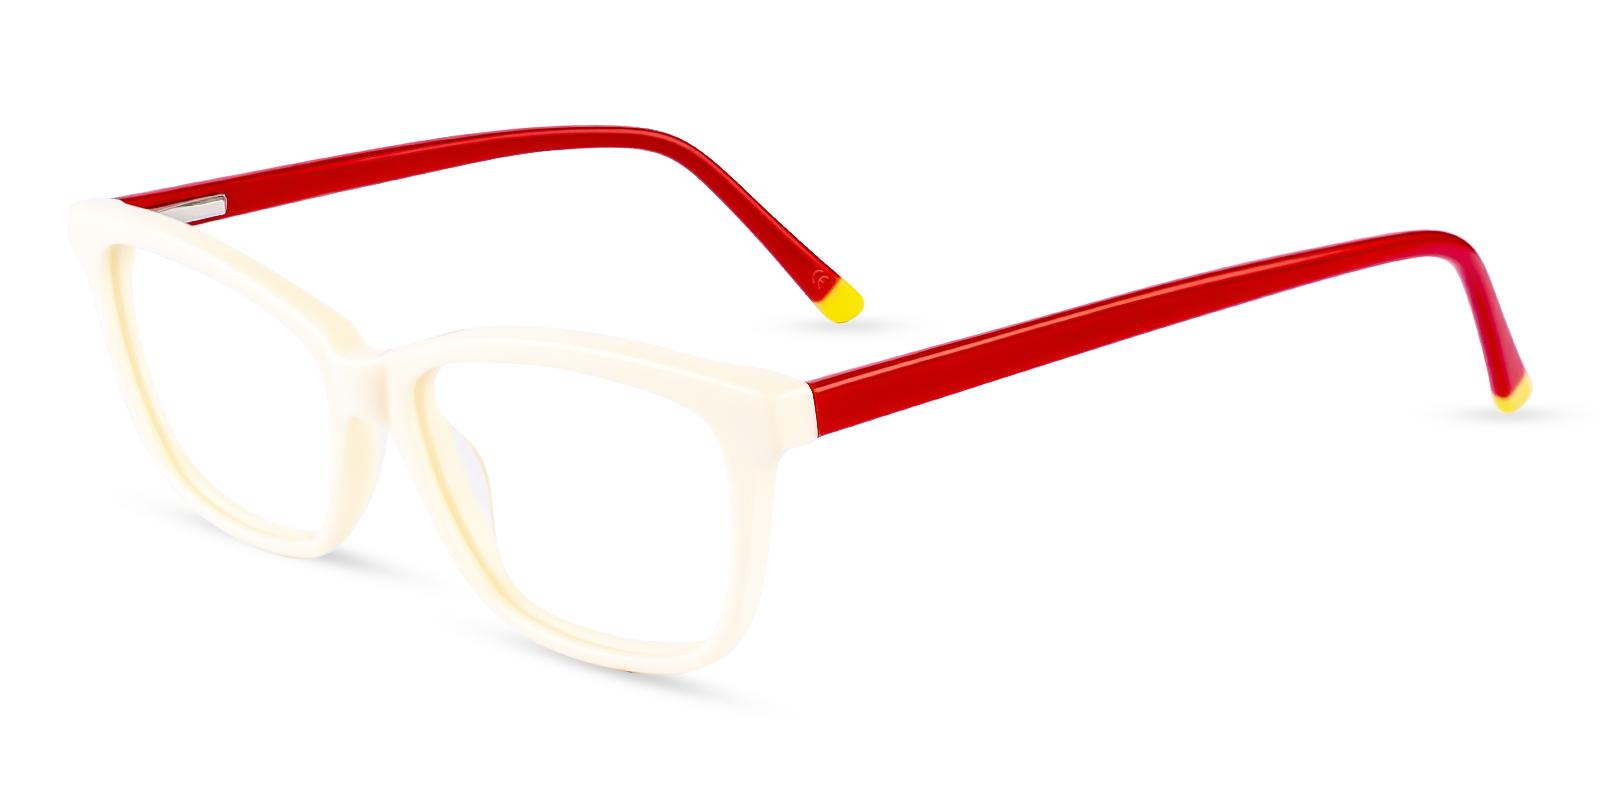 Zion White Acetate Eyeglasses , SpringHinges , UniversalBridgeFit Frames from ABBE Glasses